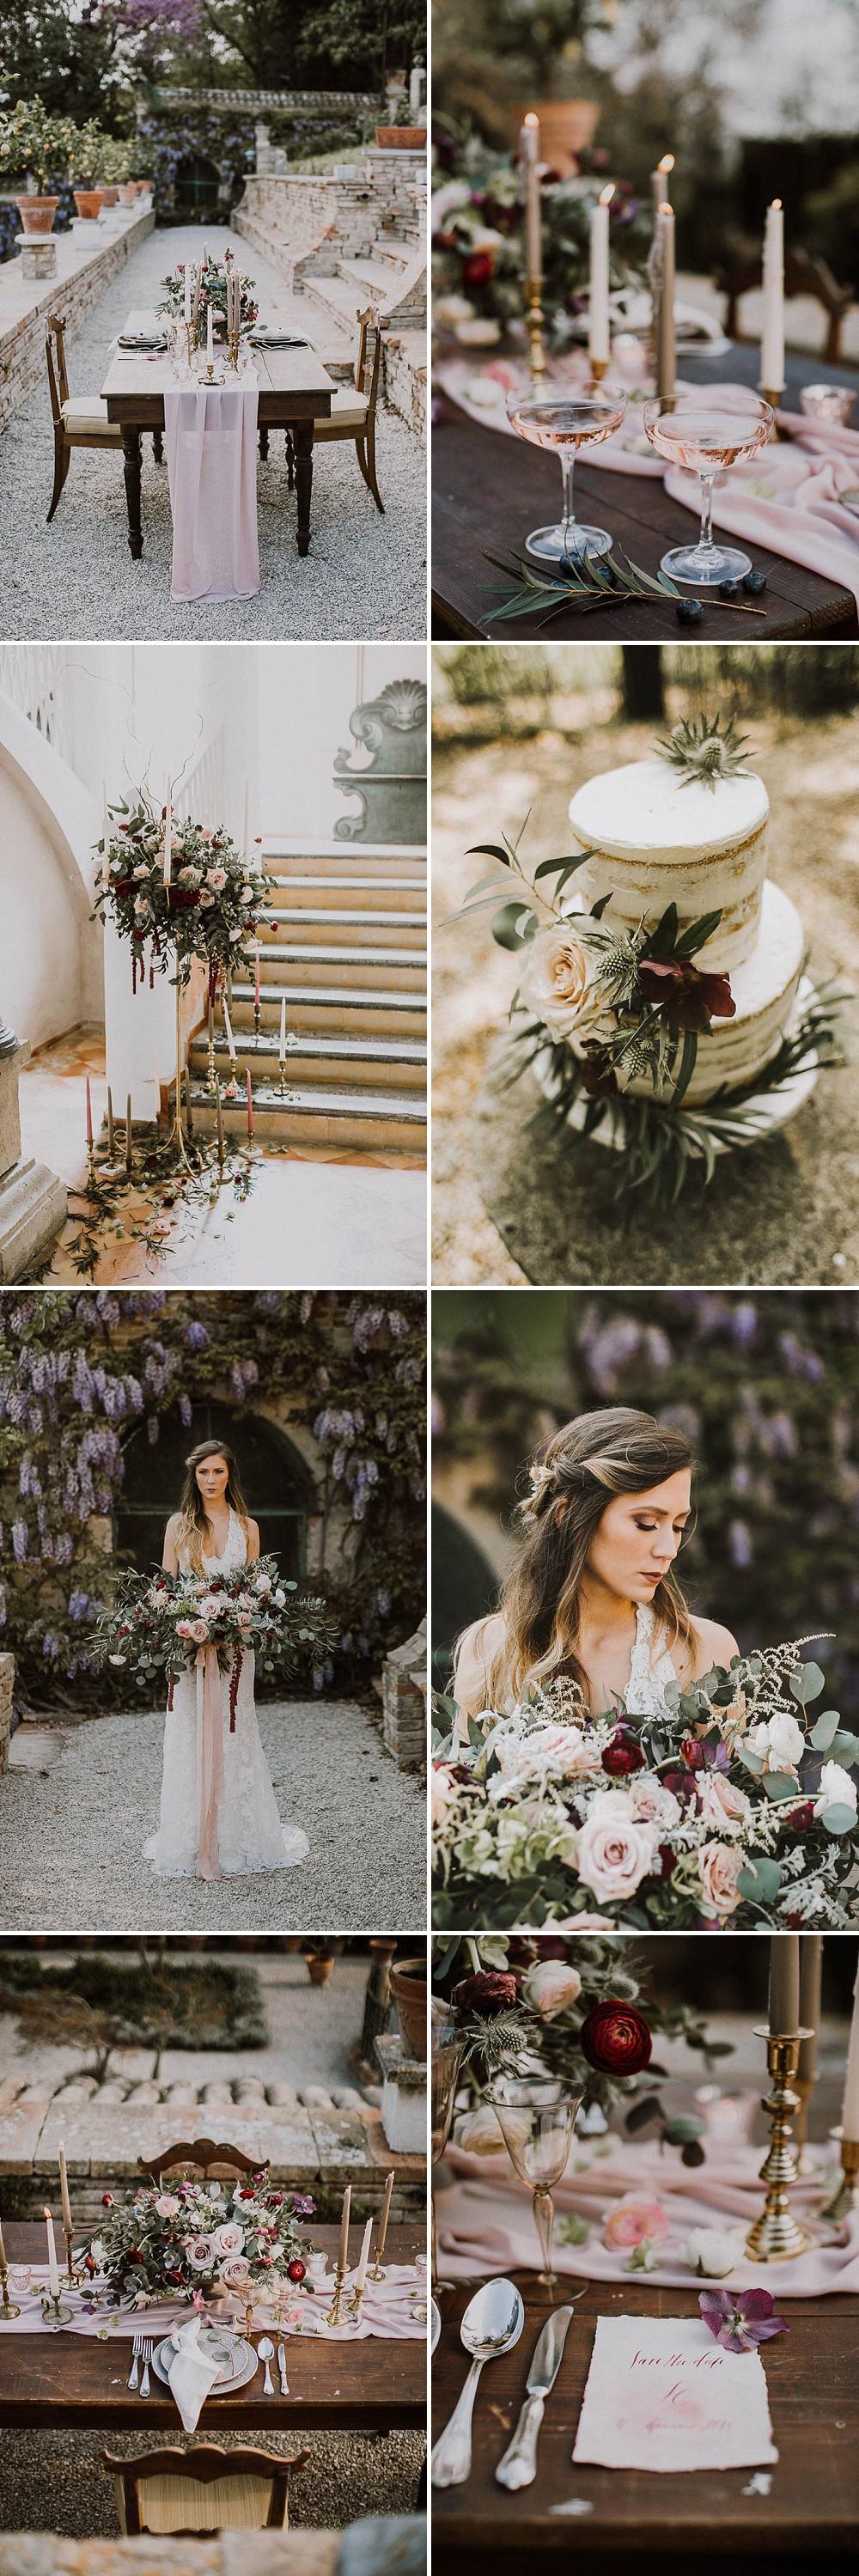 Destination Wedding Inspiration With A Rose Pink & Marsala Colour Palette